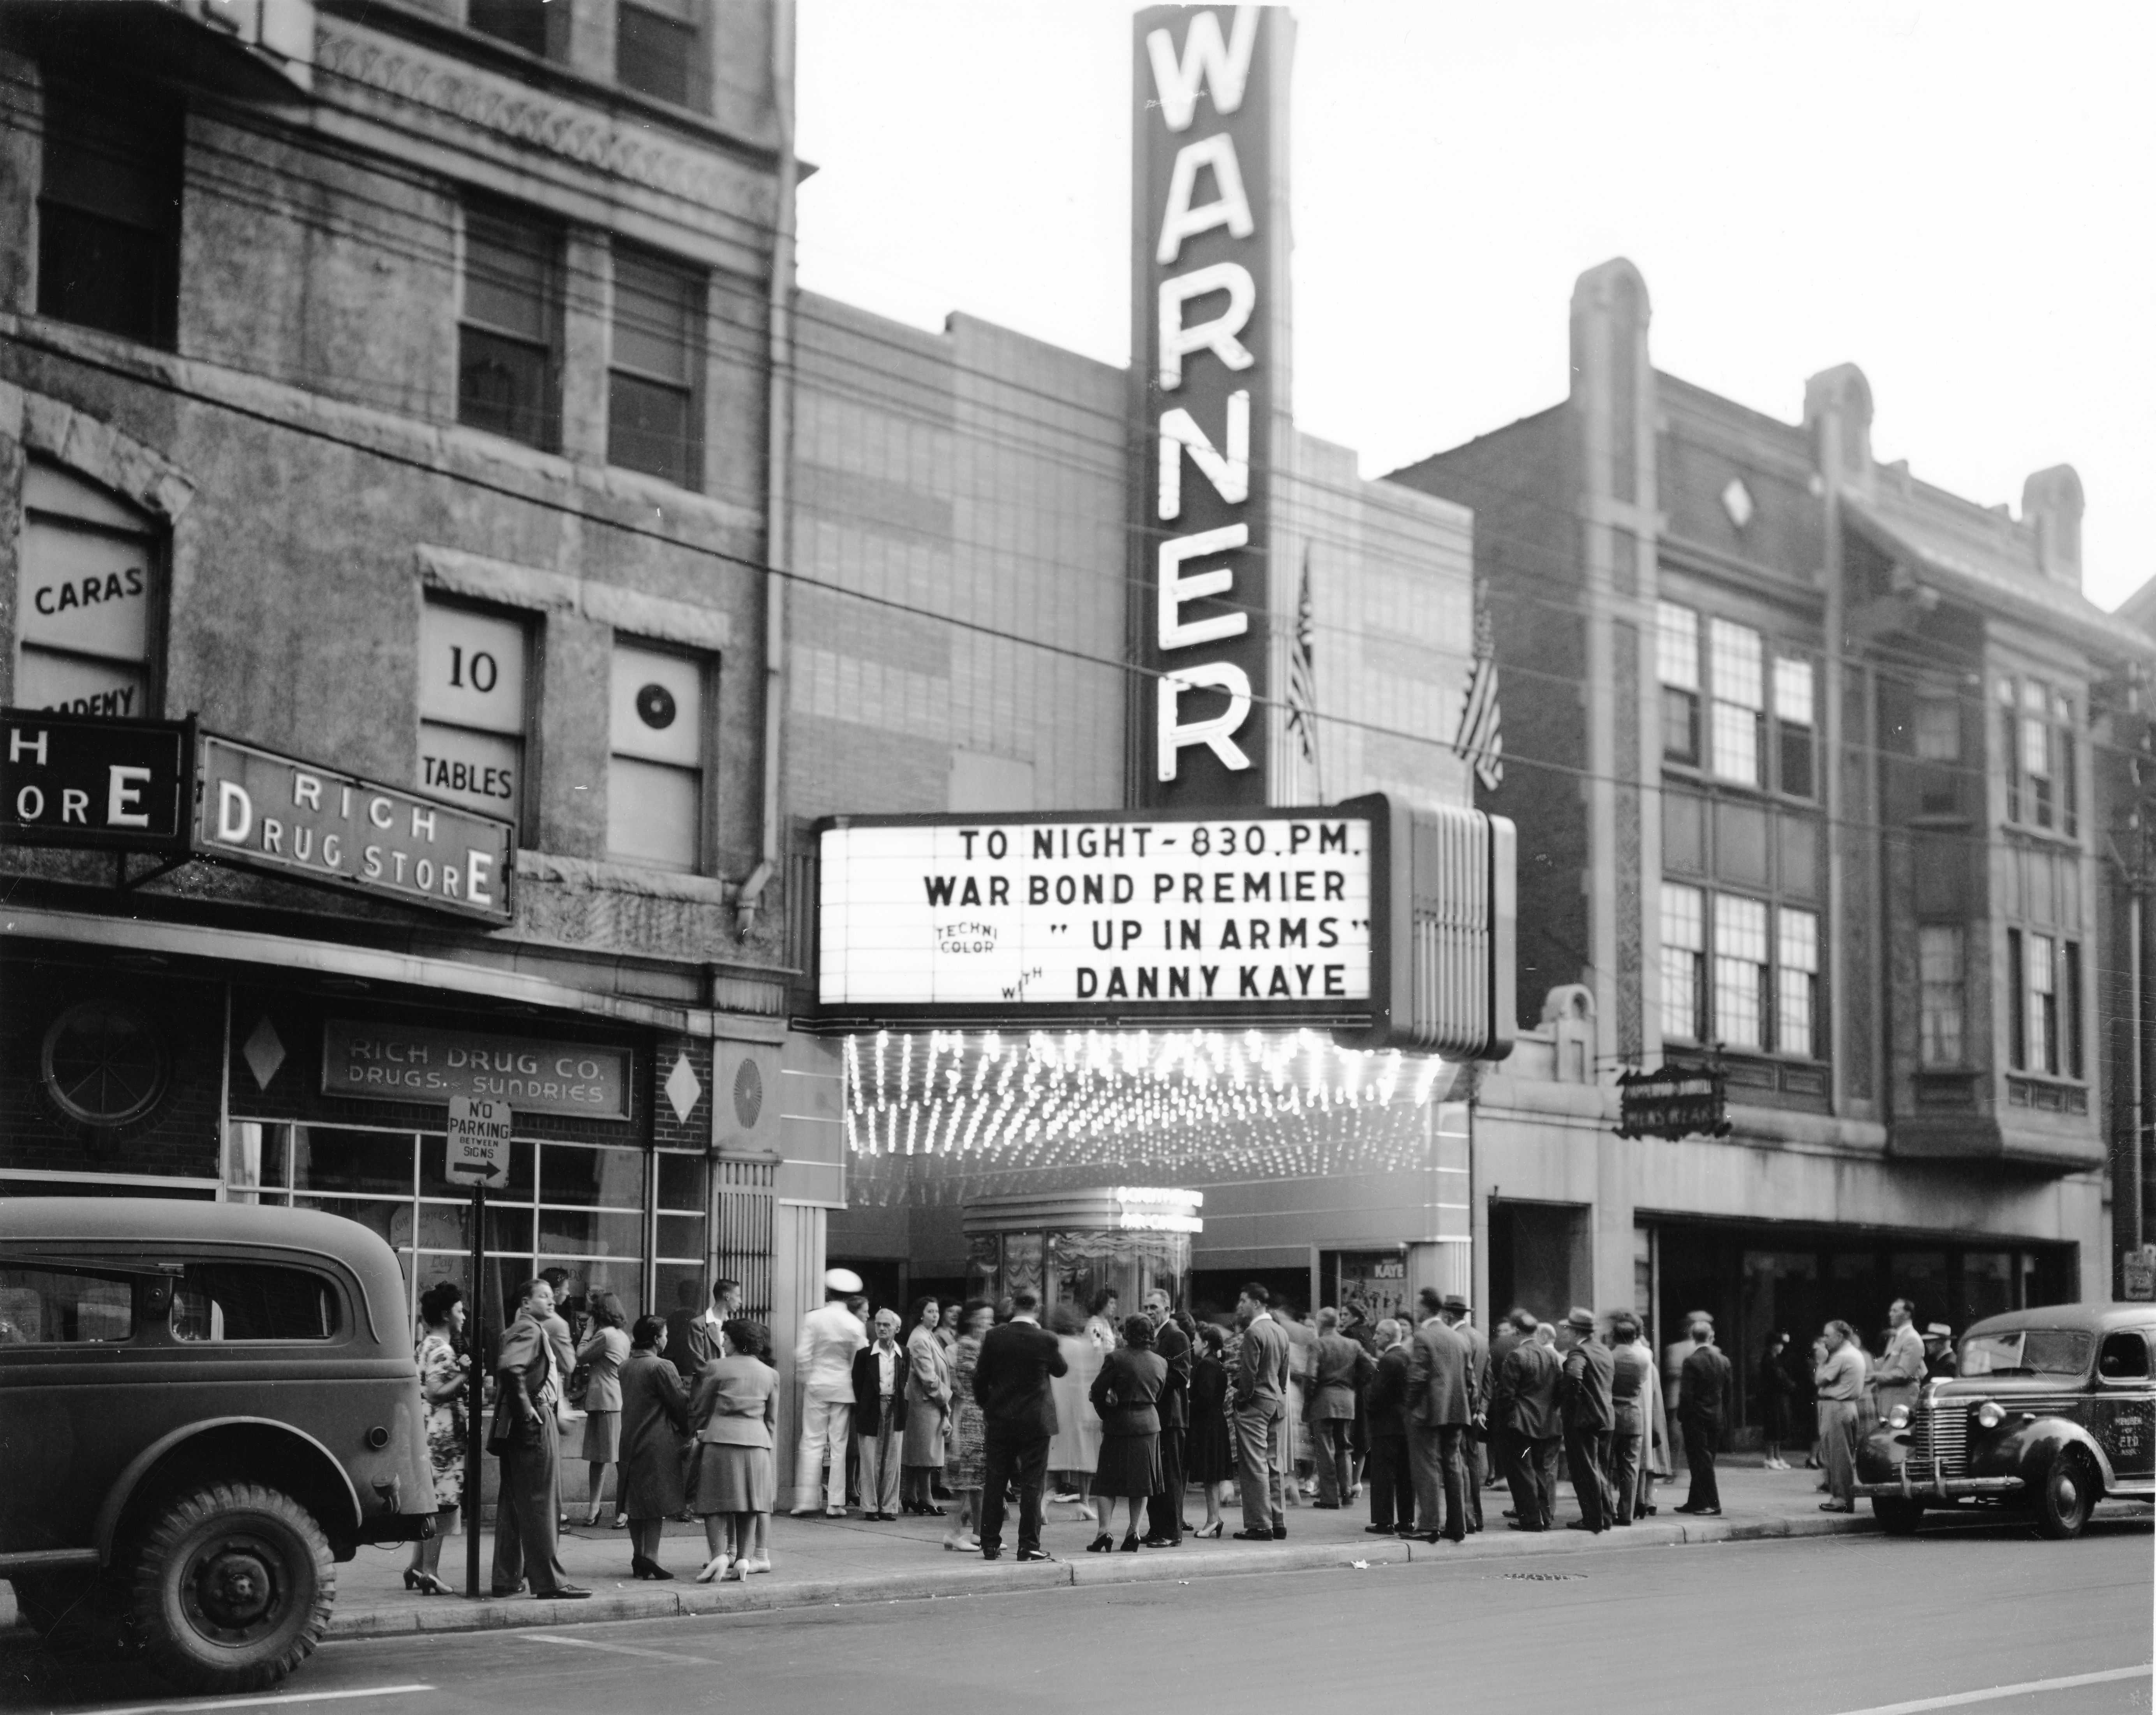 June 1944 War Bond Movie Premier At The Warner Theater On Delaware Avenue Wilmington Delaware 1325 003 206 1664p Wilmington Delaware Wilmington Delaware